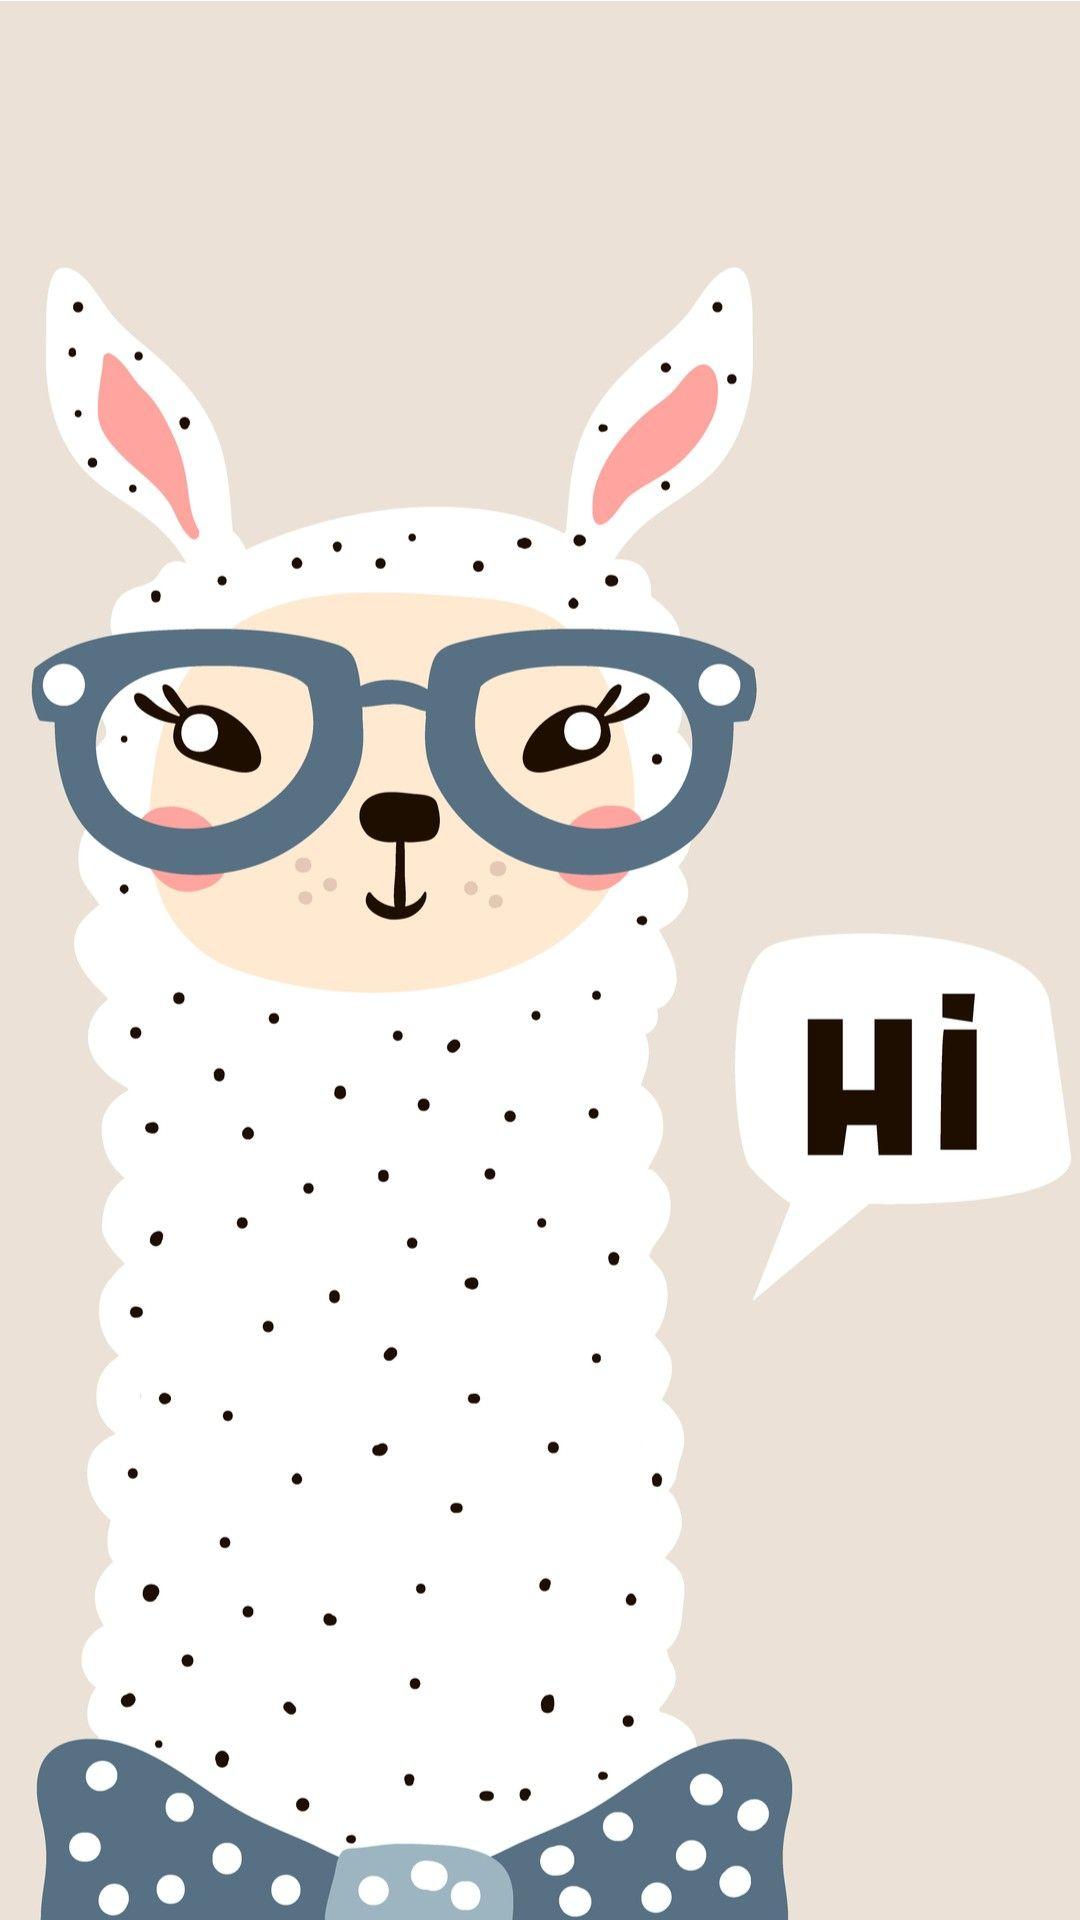 Pin By Cookiie On Kawaii Iphone Wallpaper Cute Wallpapers Cute Llama